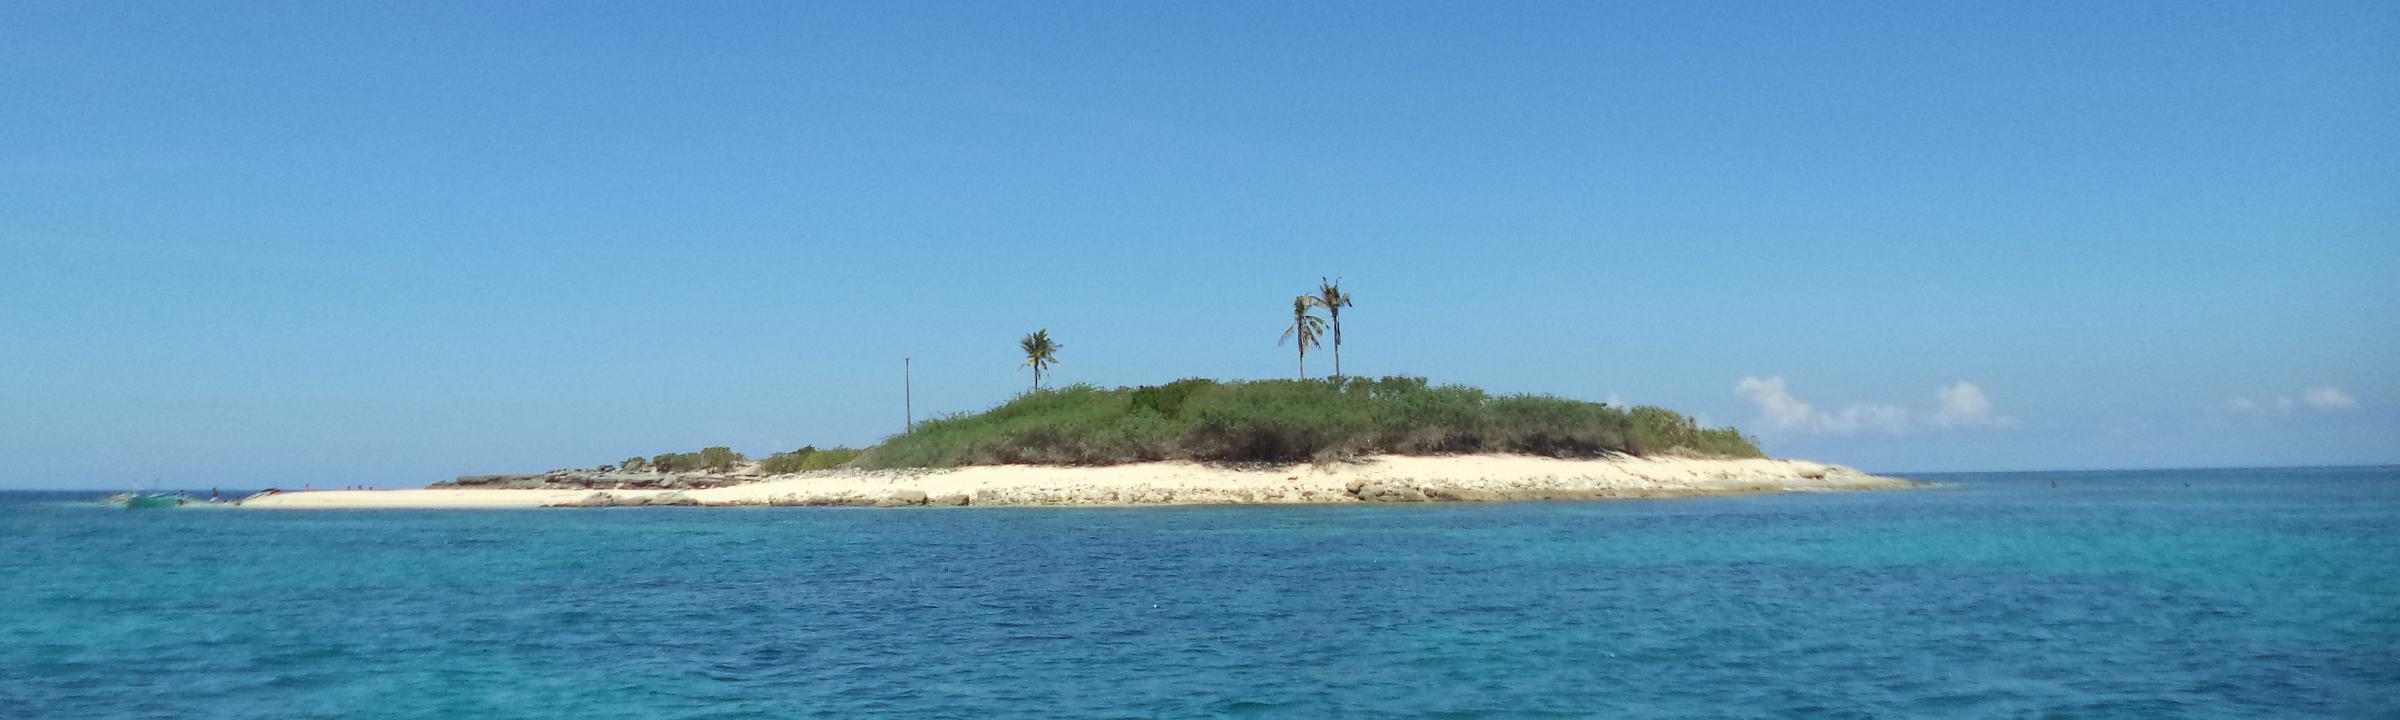 Mystique Island, Dasol, Pangasinan